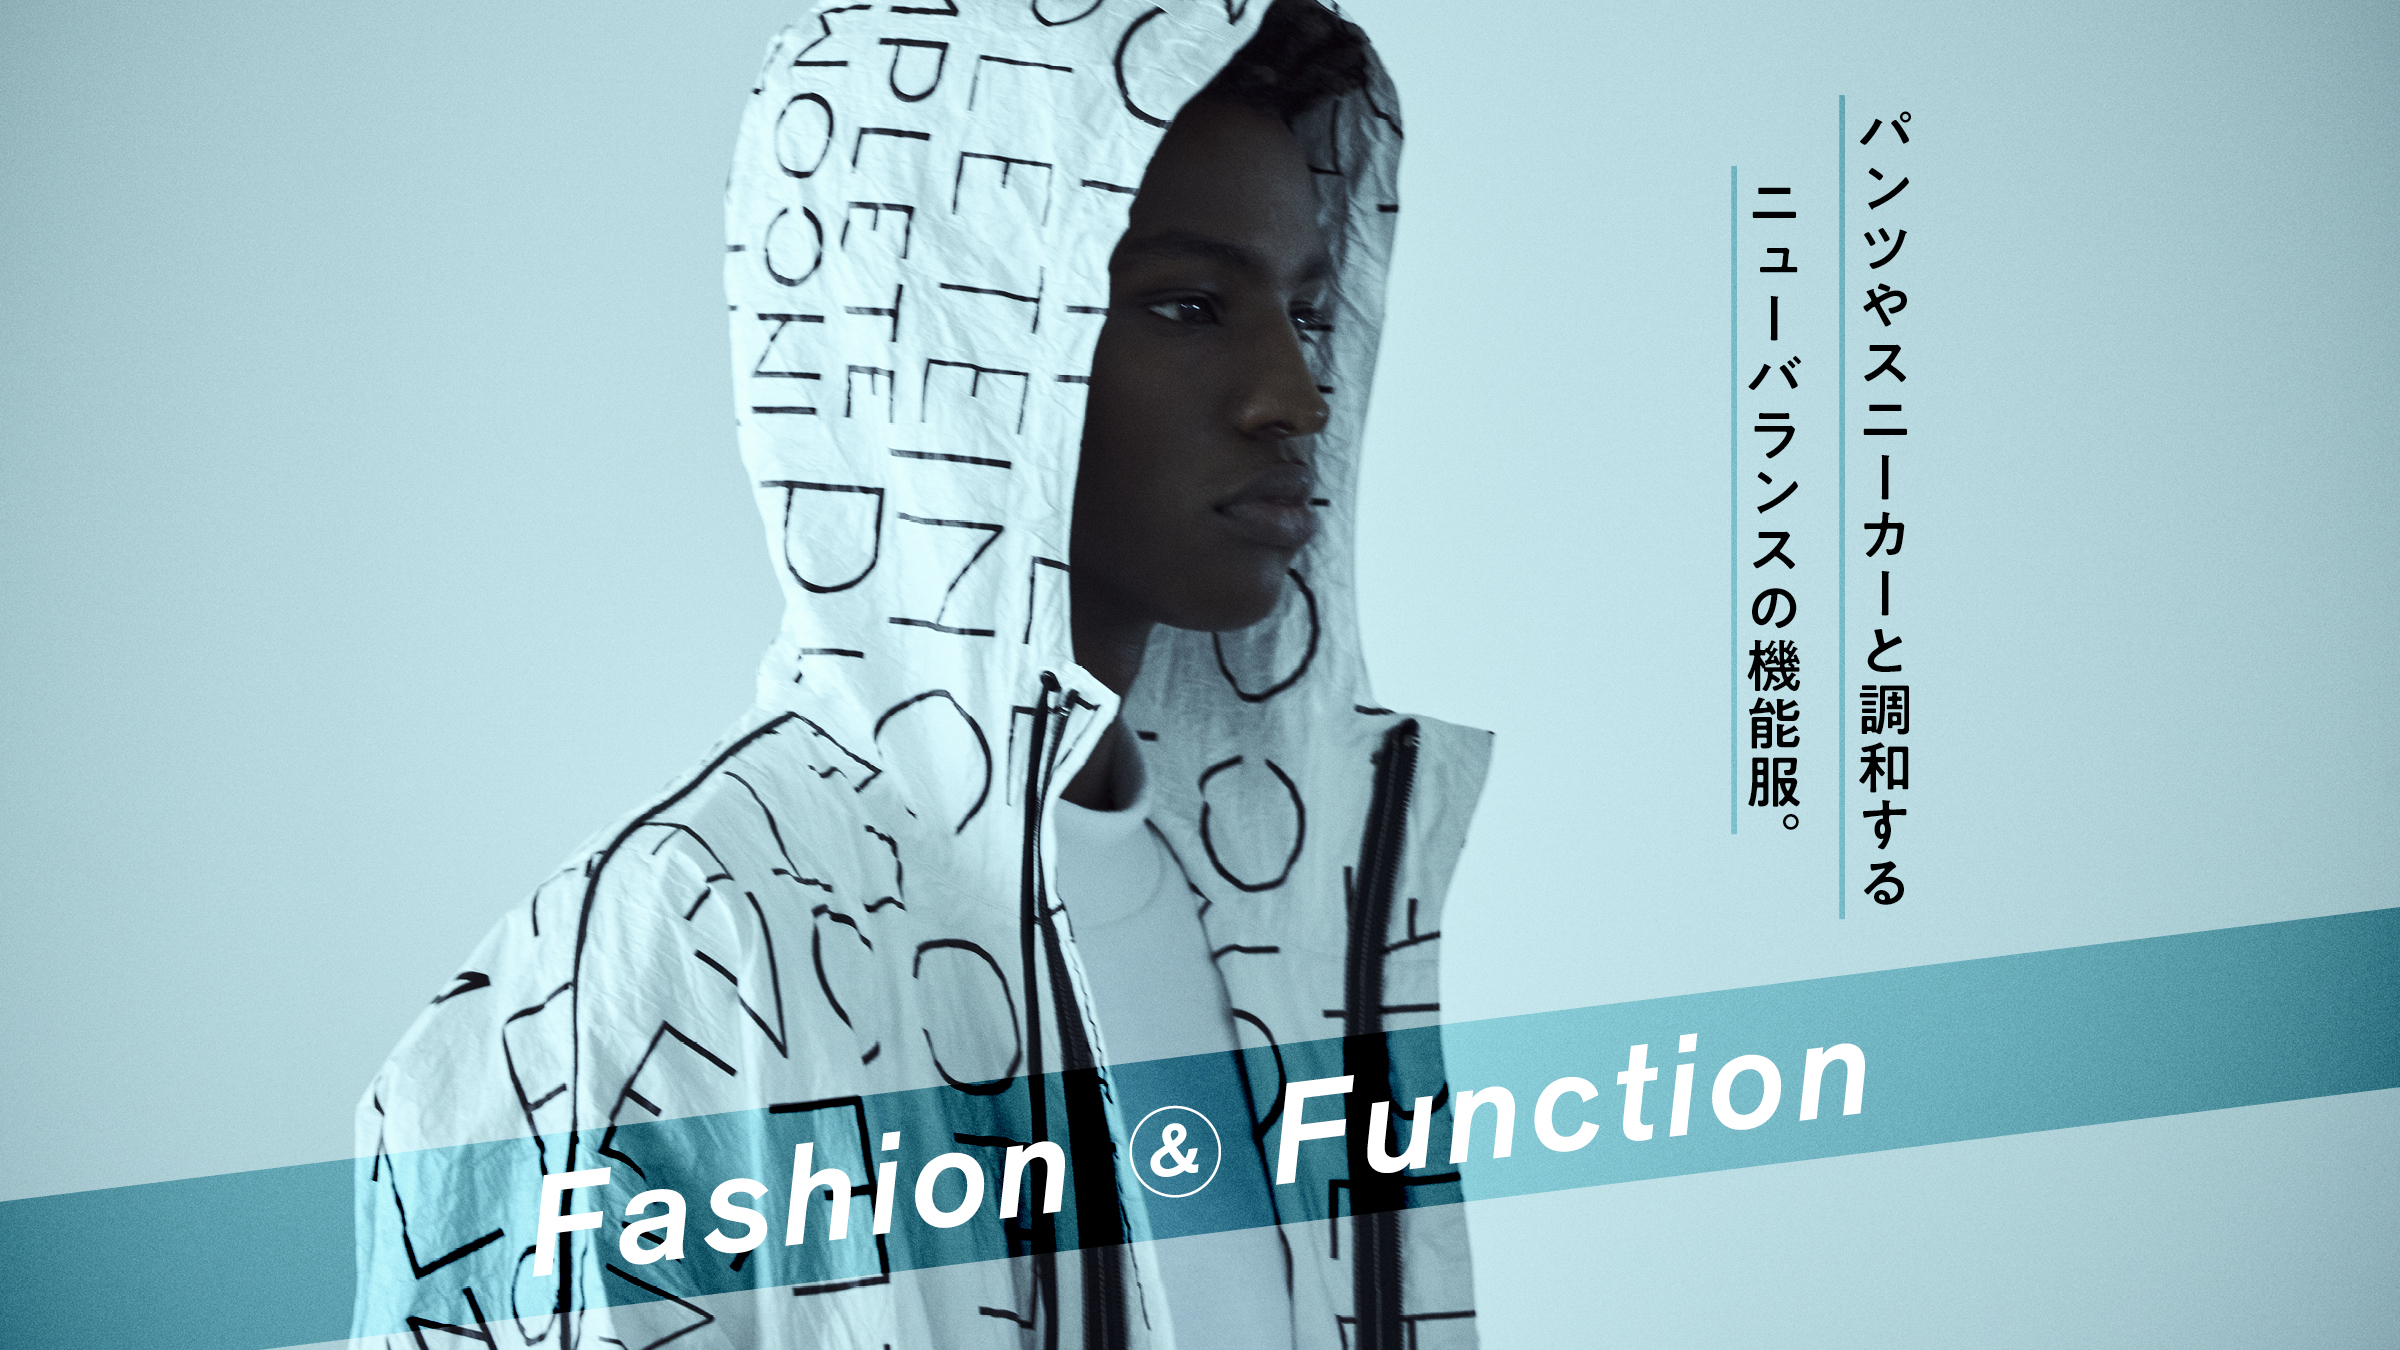 Fashion & Function<br>パンツやスニーカーと調和するニュ−バランスの機能服。